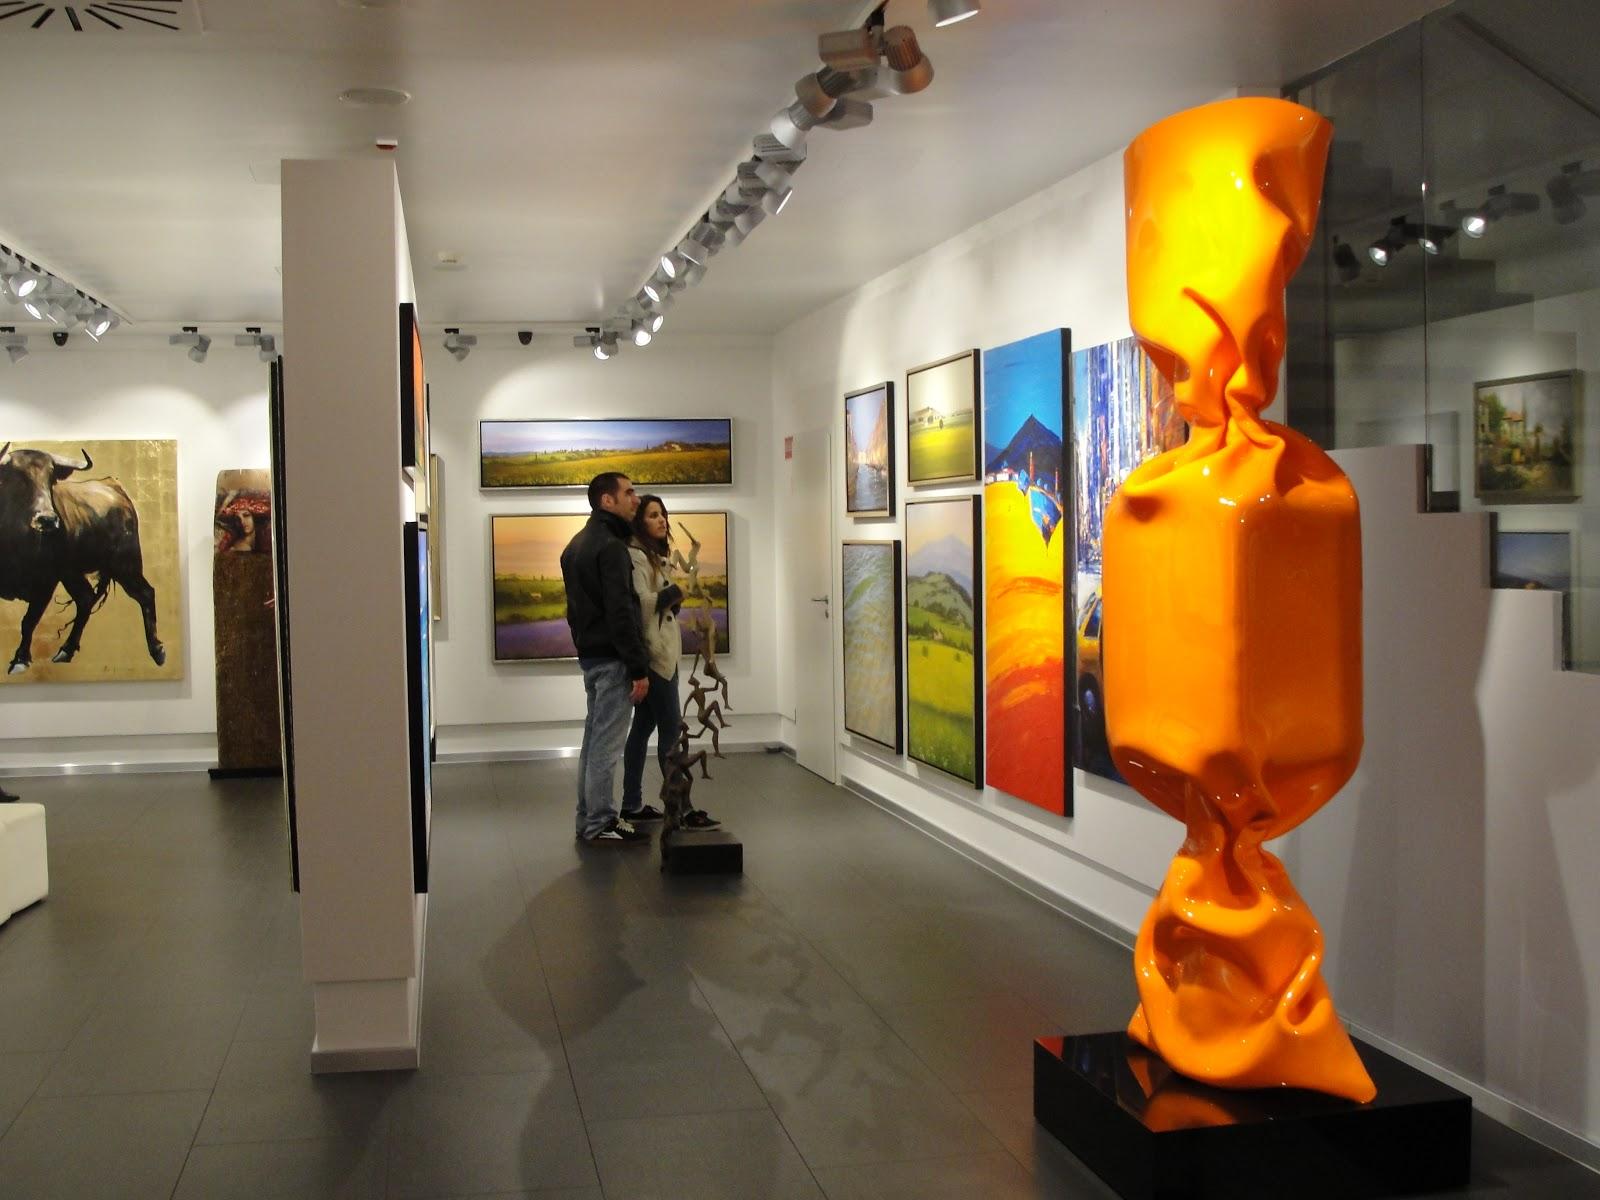 Mensing Galerie arte con gominolas empalmado